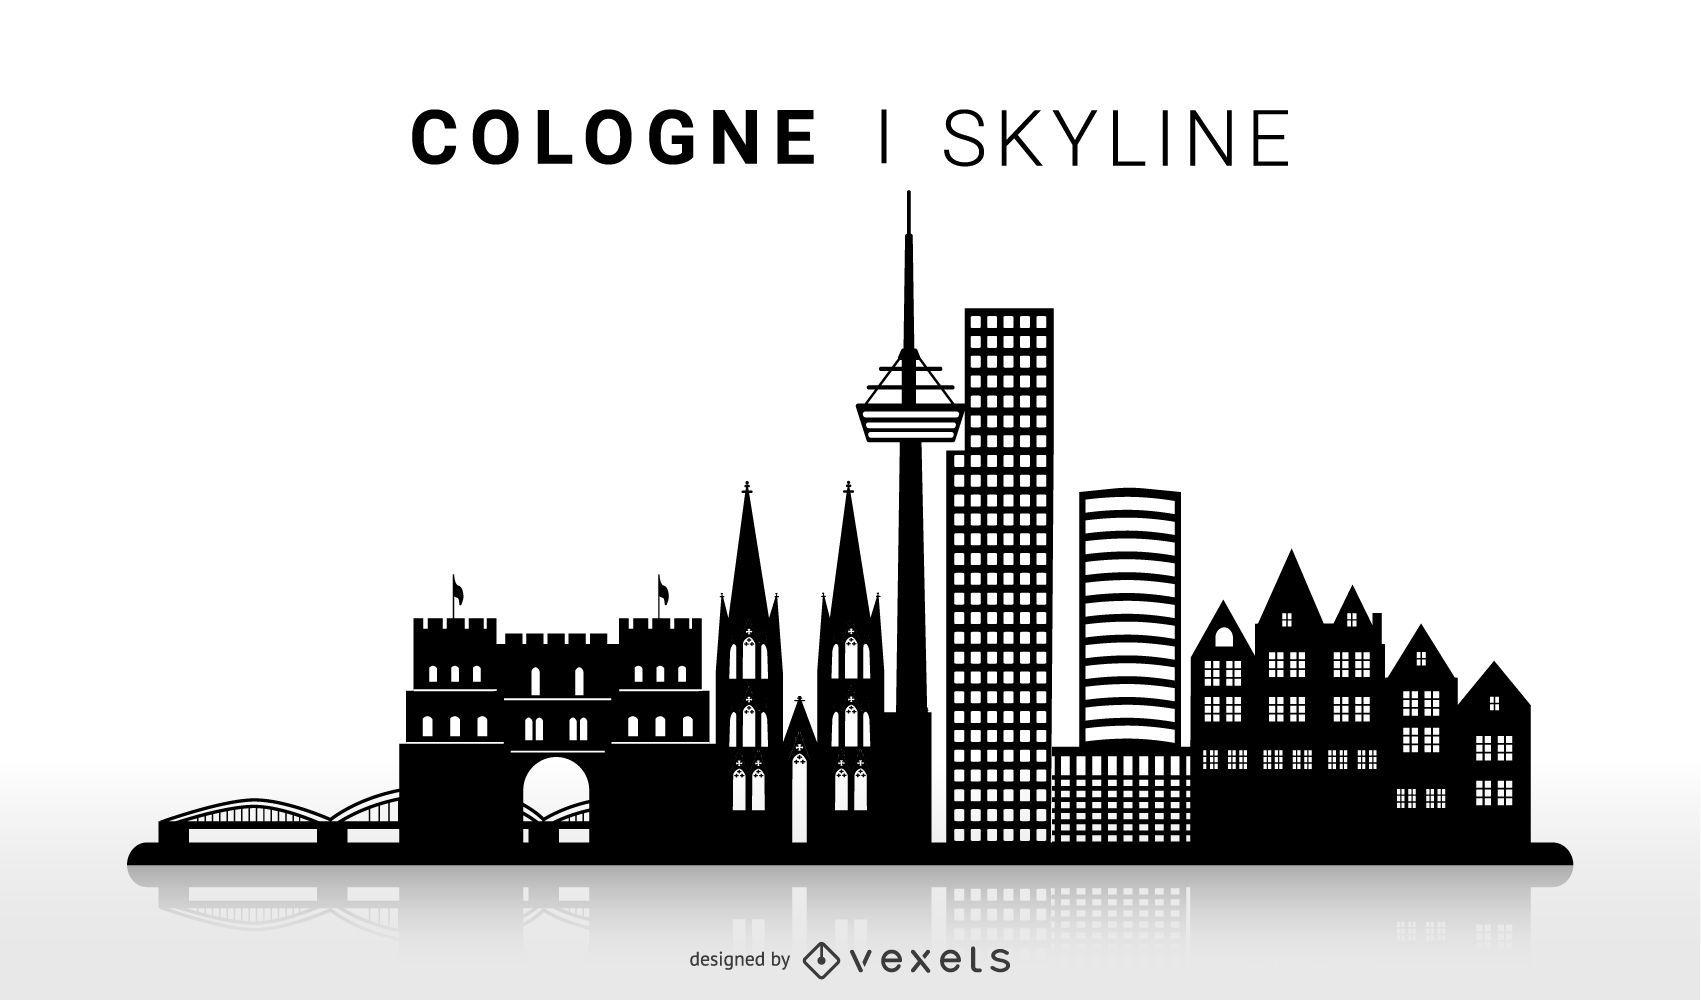 Cologne Skyline Silhouette Design